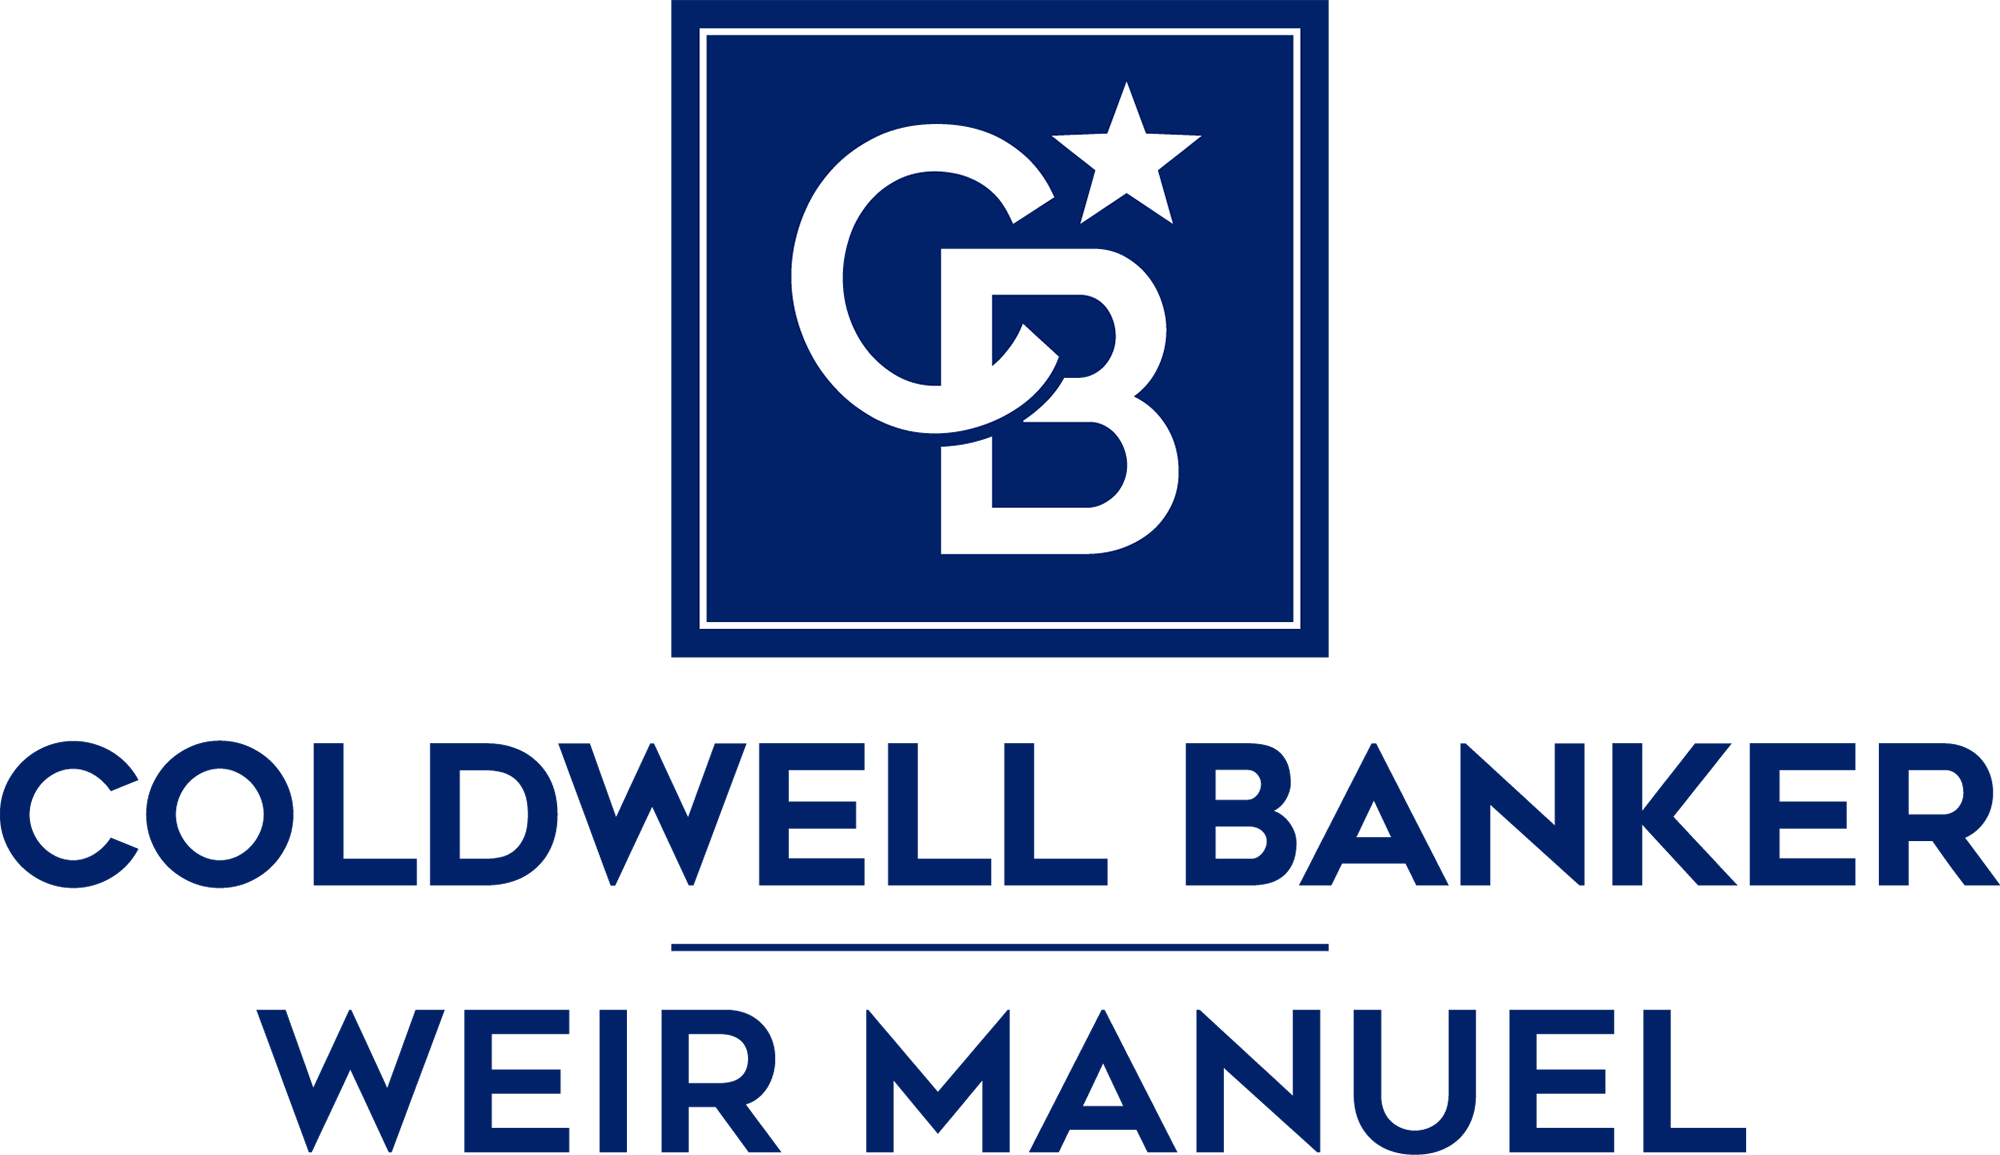 David Smyth - Coldwell Banker Weir Manuel Logo